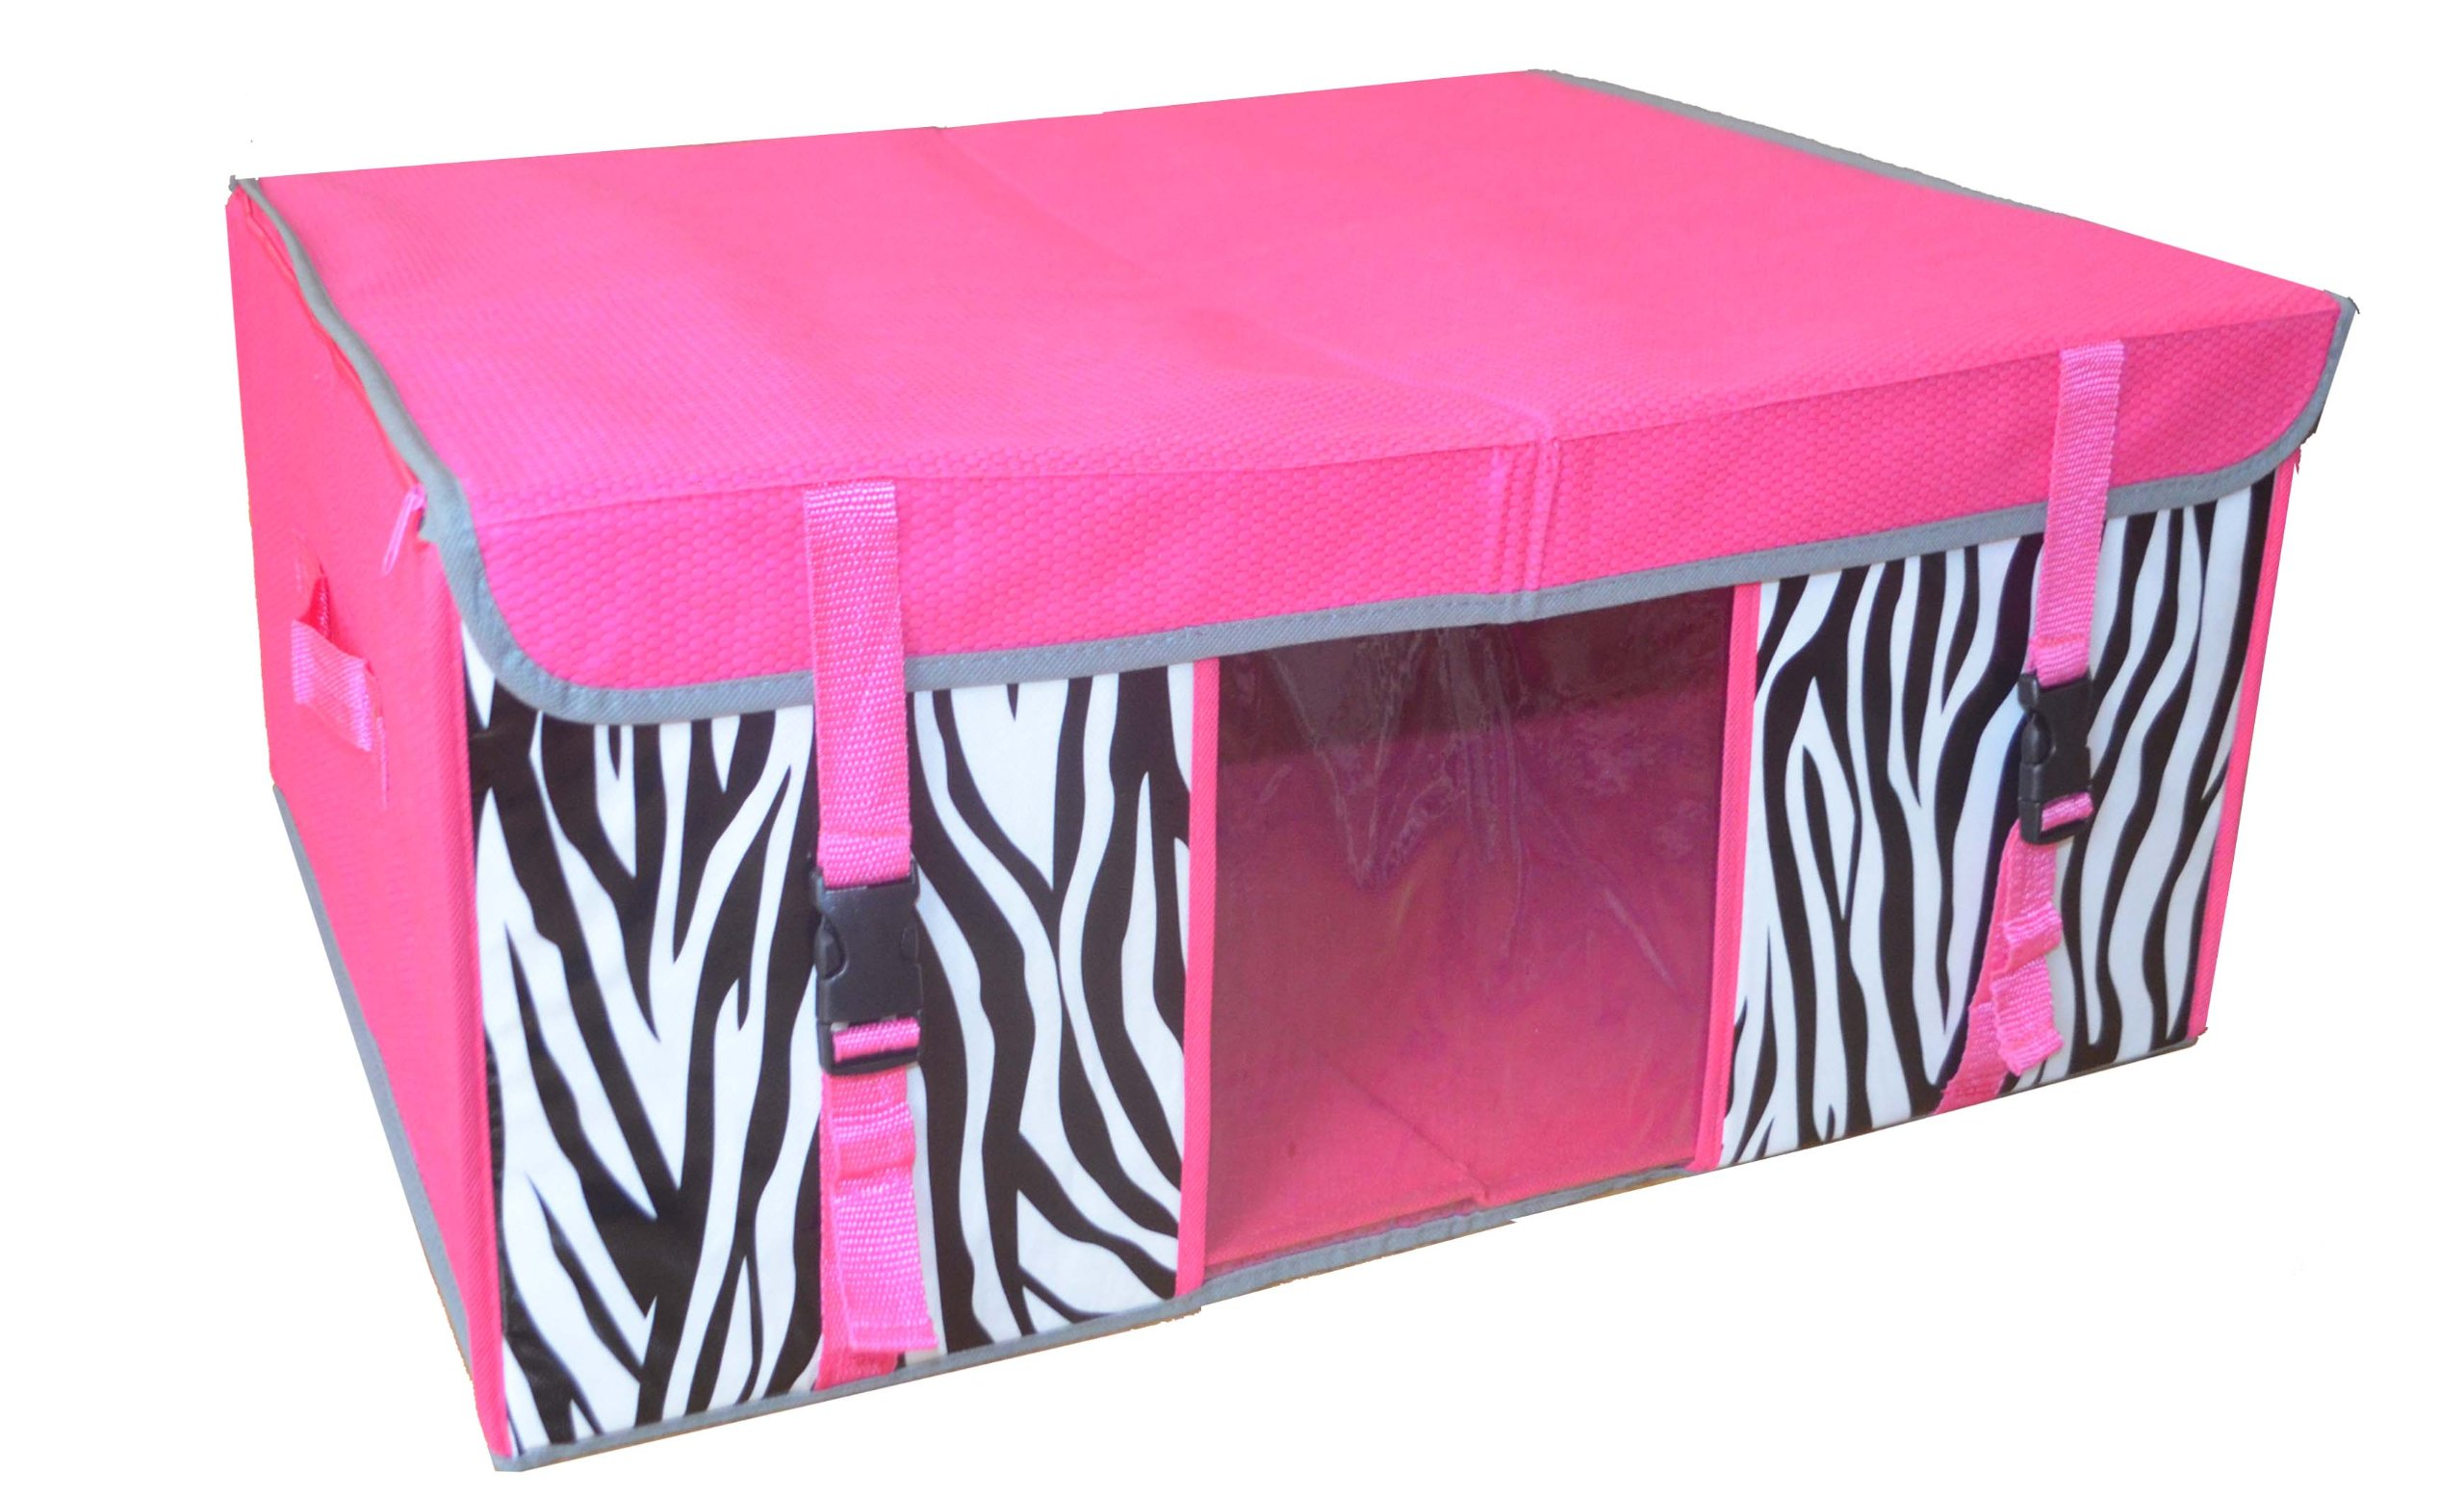 Collapsible Jumbo Storage Chest. Pink W/zebra Pattern. Item # 29-001